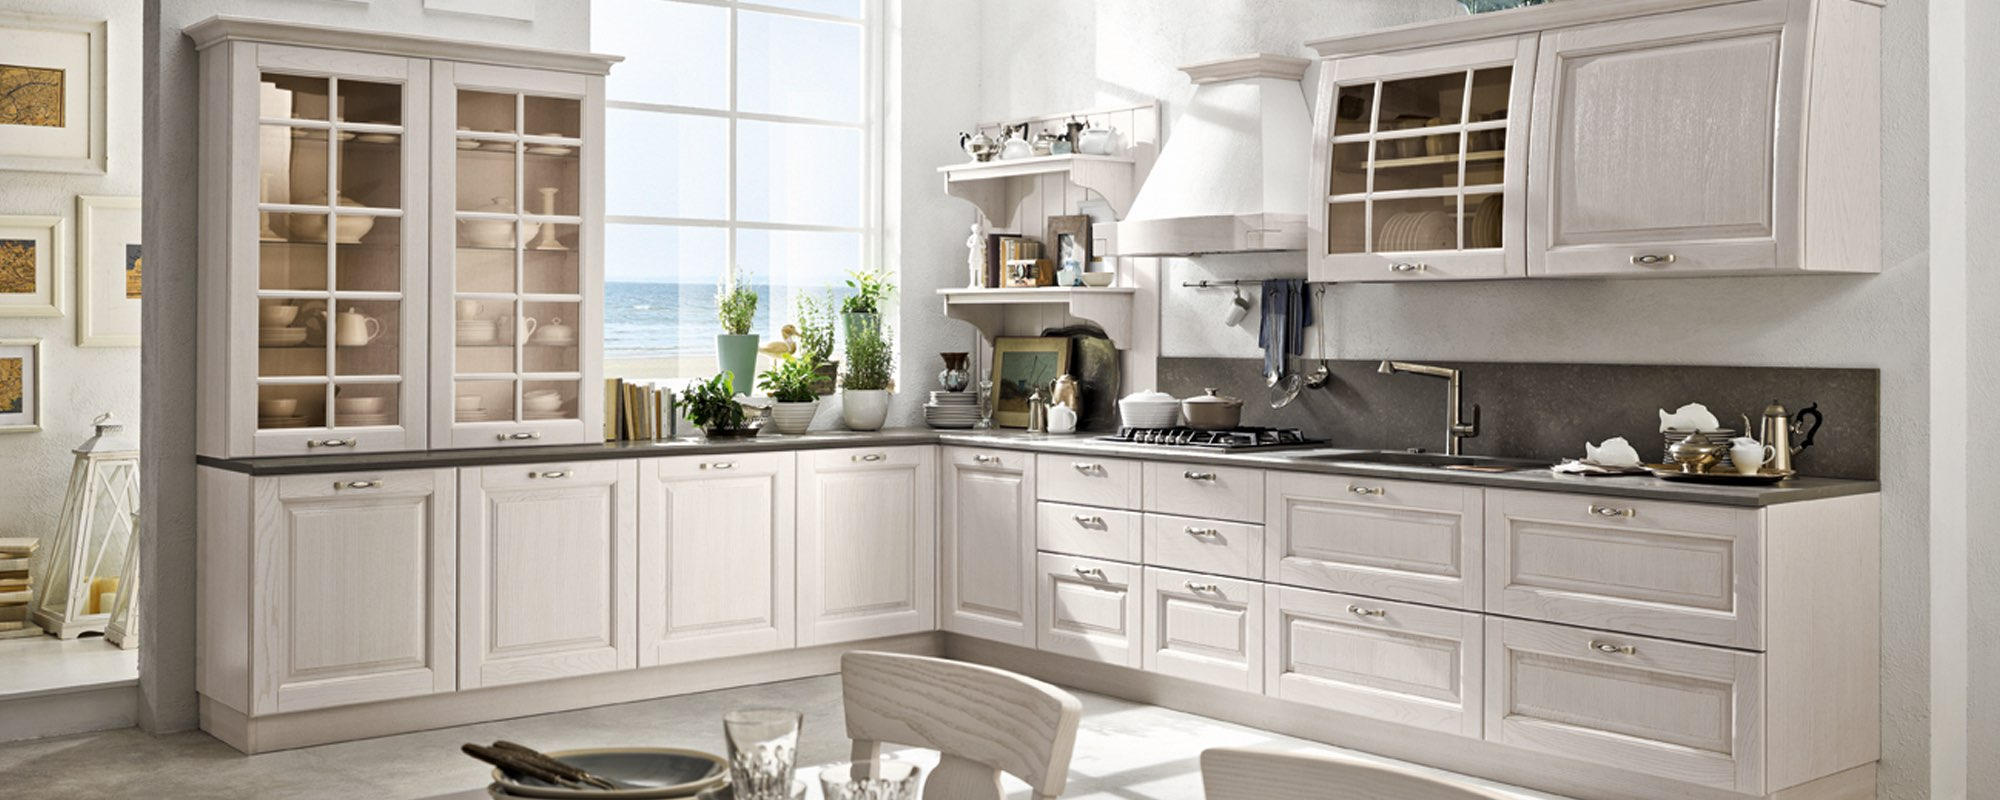 Cucina bianca Bolgheri Stosa ad angolo -BOLGHERI